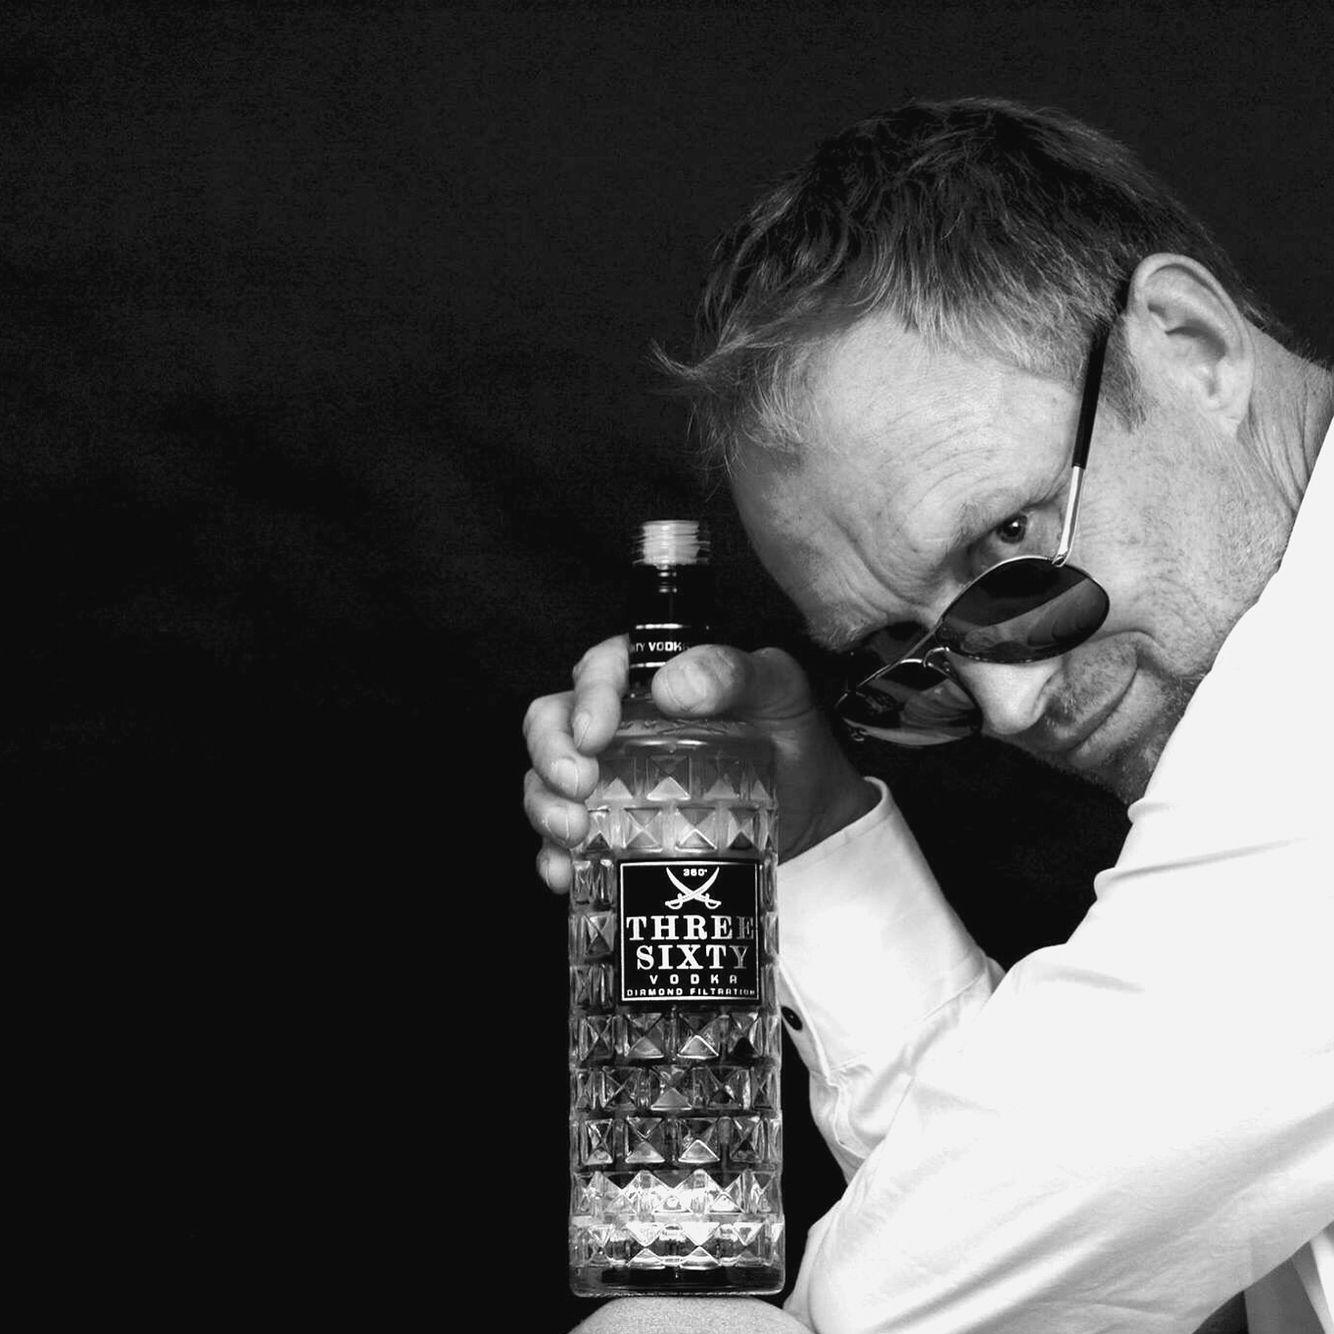 Vodkaman